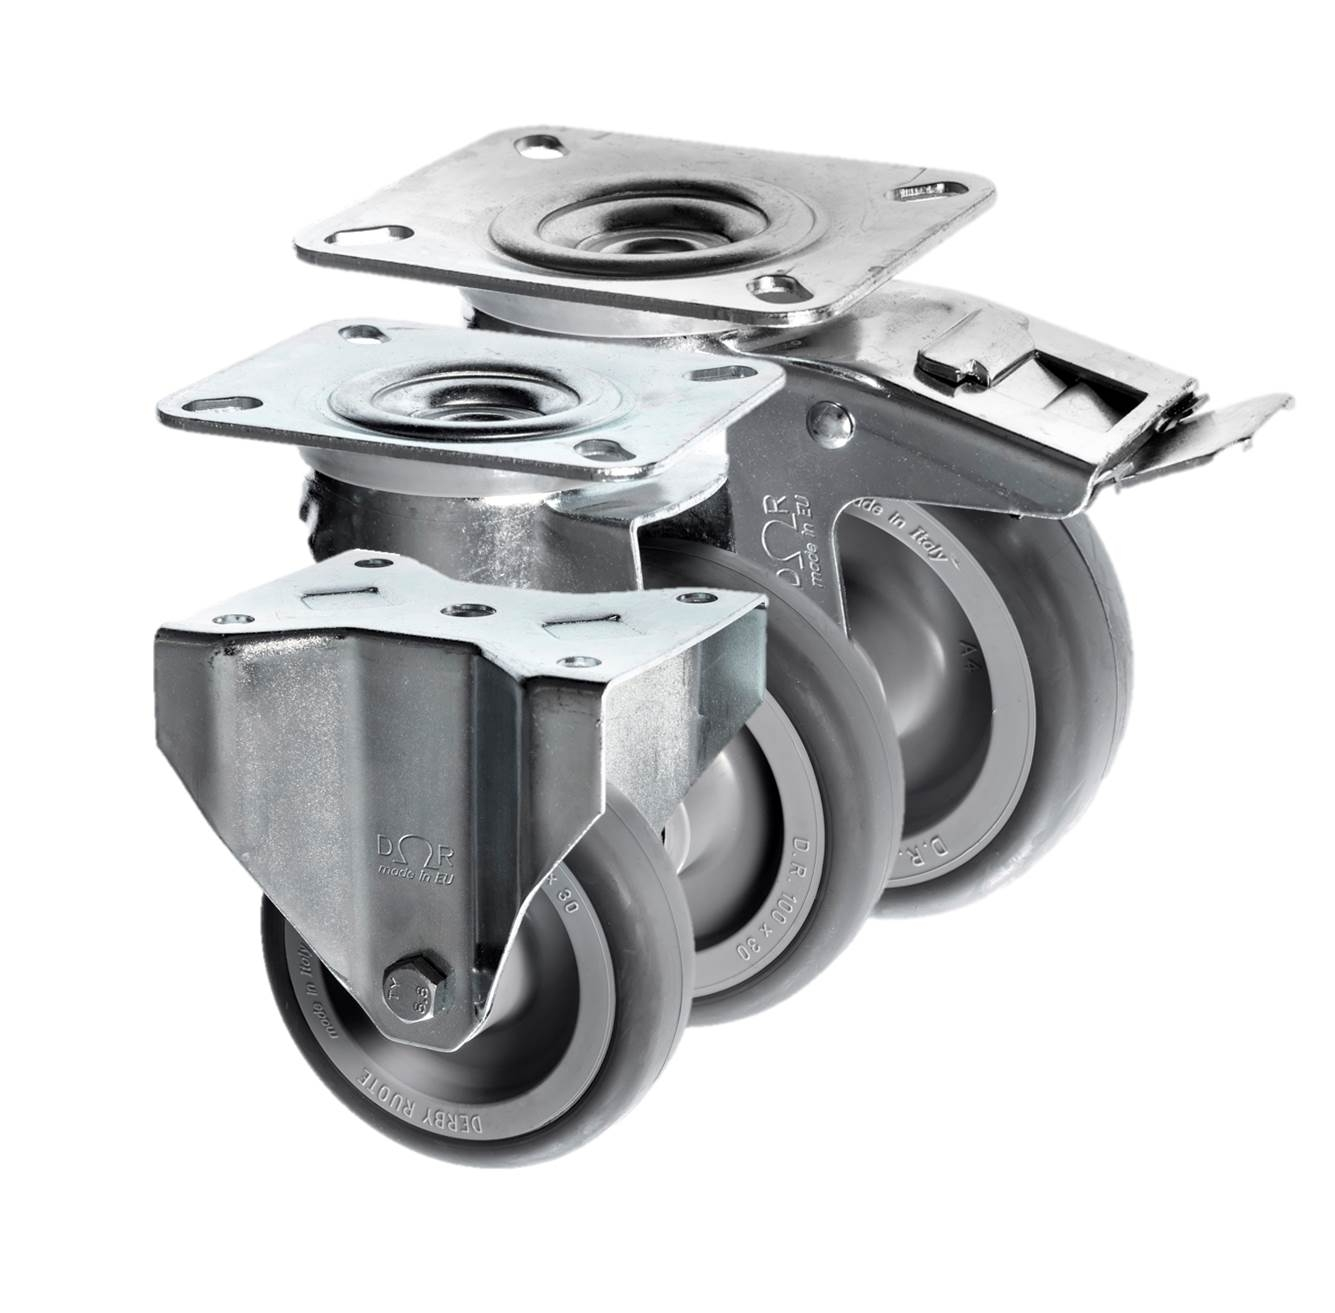 Thermoplastic Rubber Castors 3360 Series